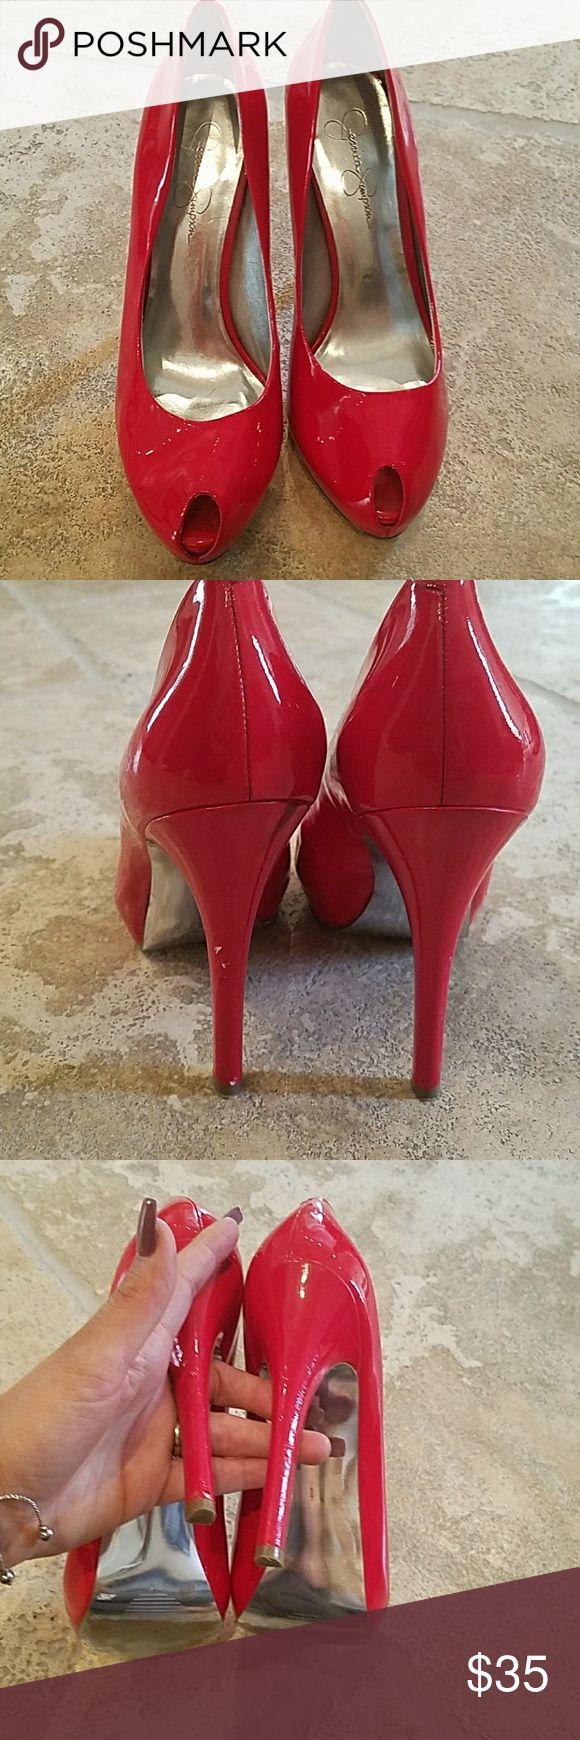 Red patent Jessica Simpson heels Sexy cherry red peptoe heels Shoes Heels